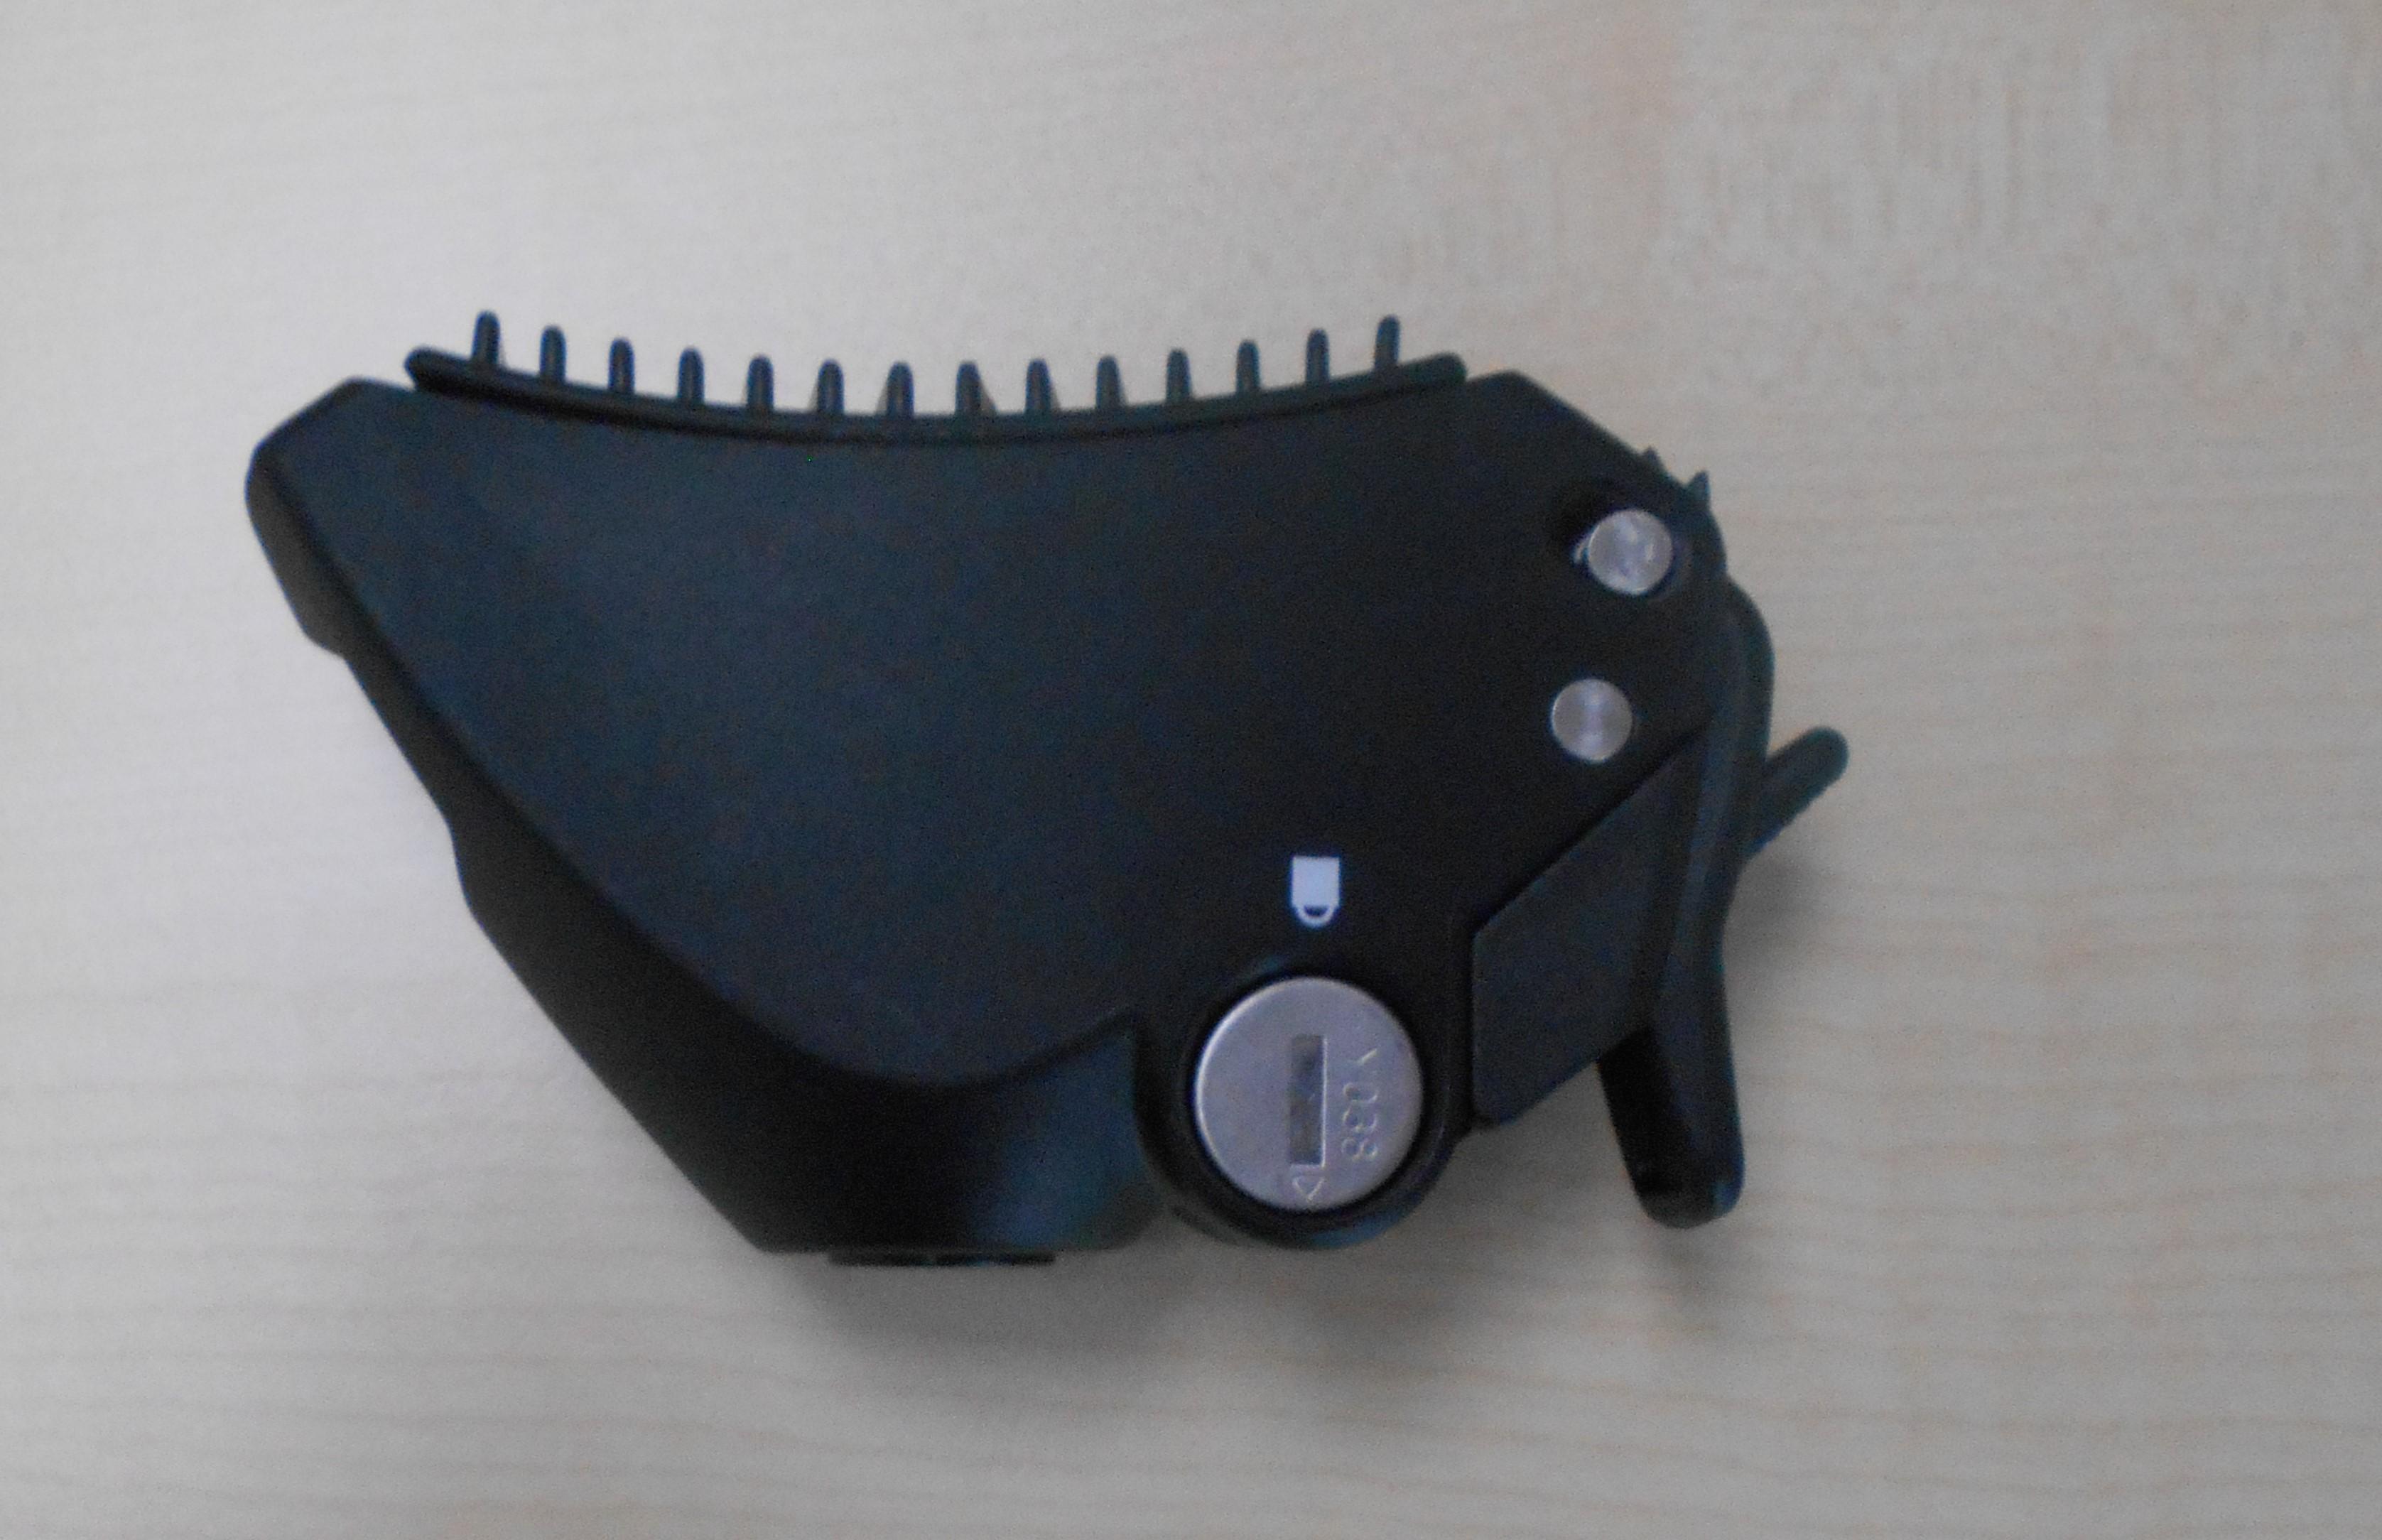 Kopf E-Bike Rahmenhalter mit Schlosscode Y005